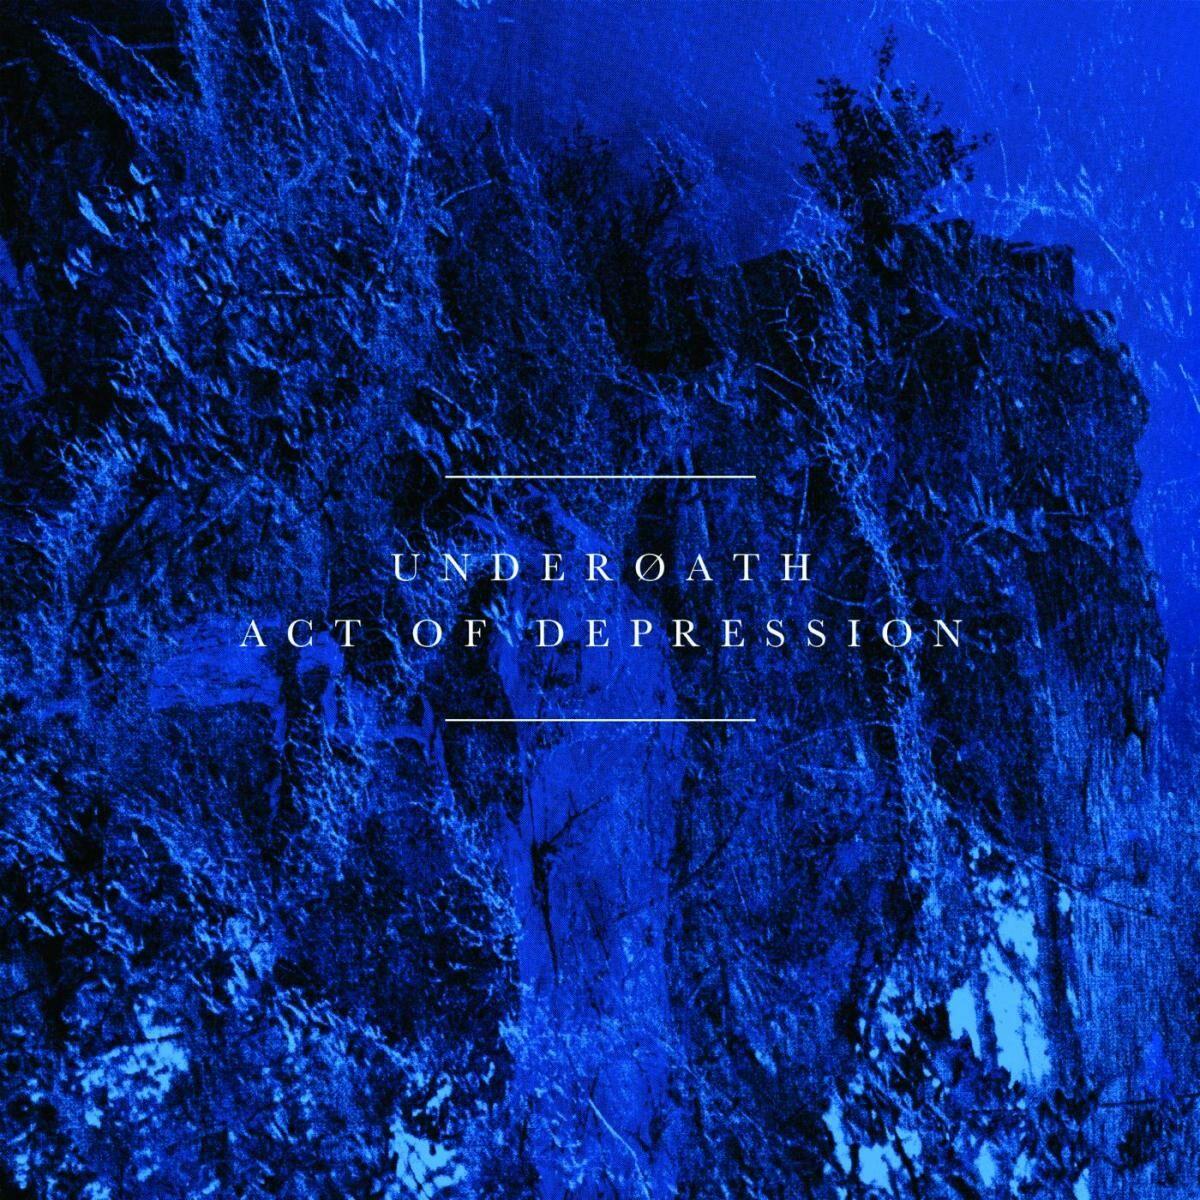 Underoath - Act of Depression (Reissue) (2013)